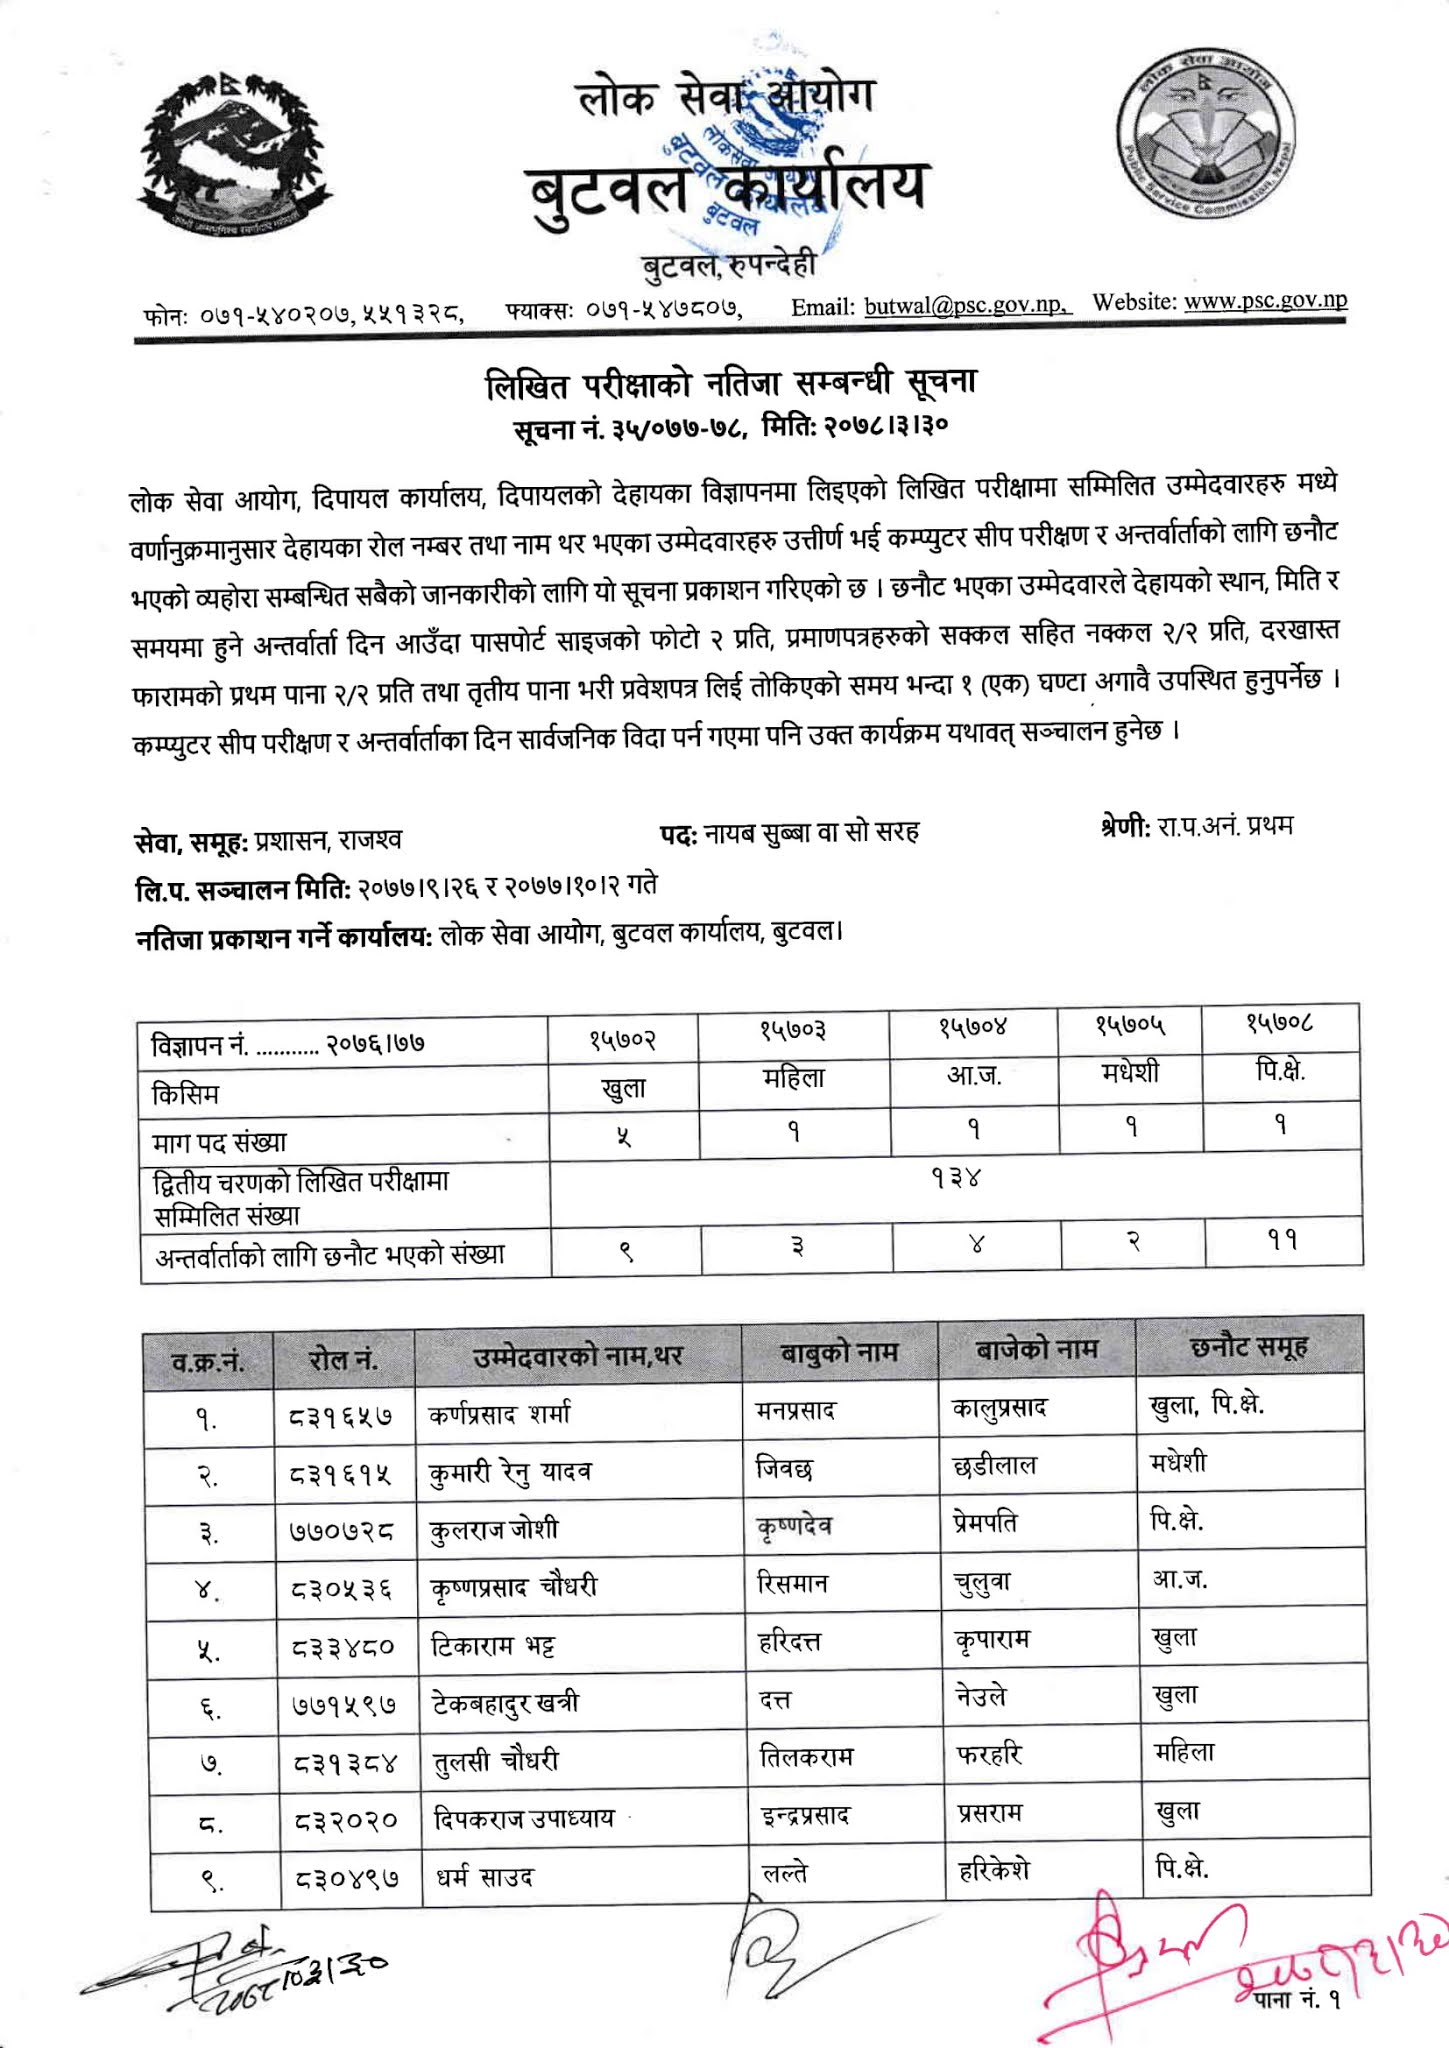 NASU Revenue - Dipayal Lok Sewa Aayog Written Exam Result & Exam Schedule